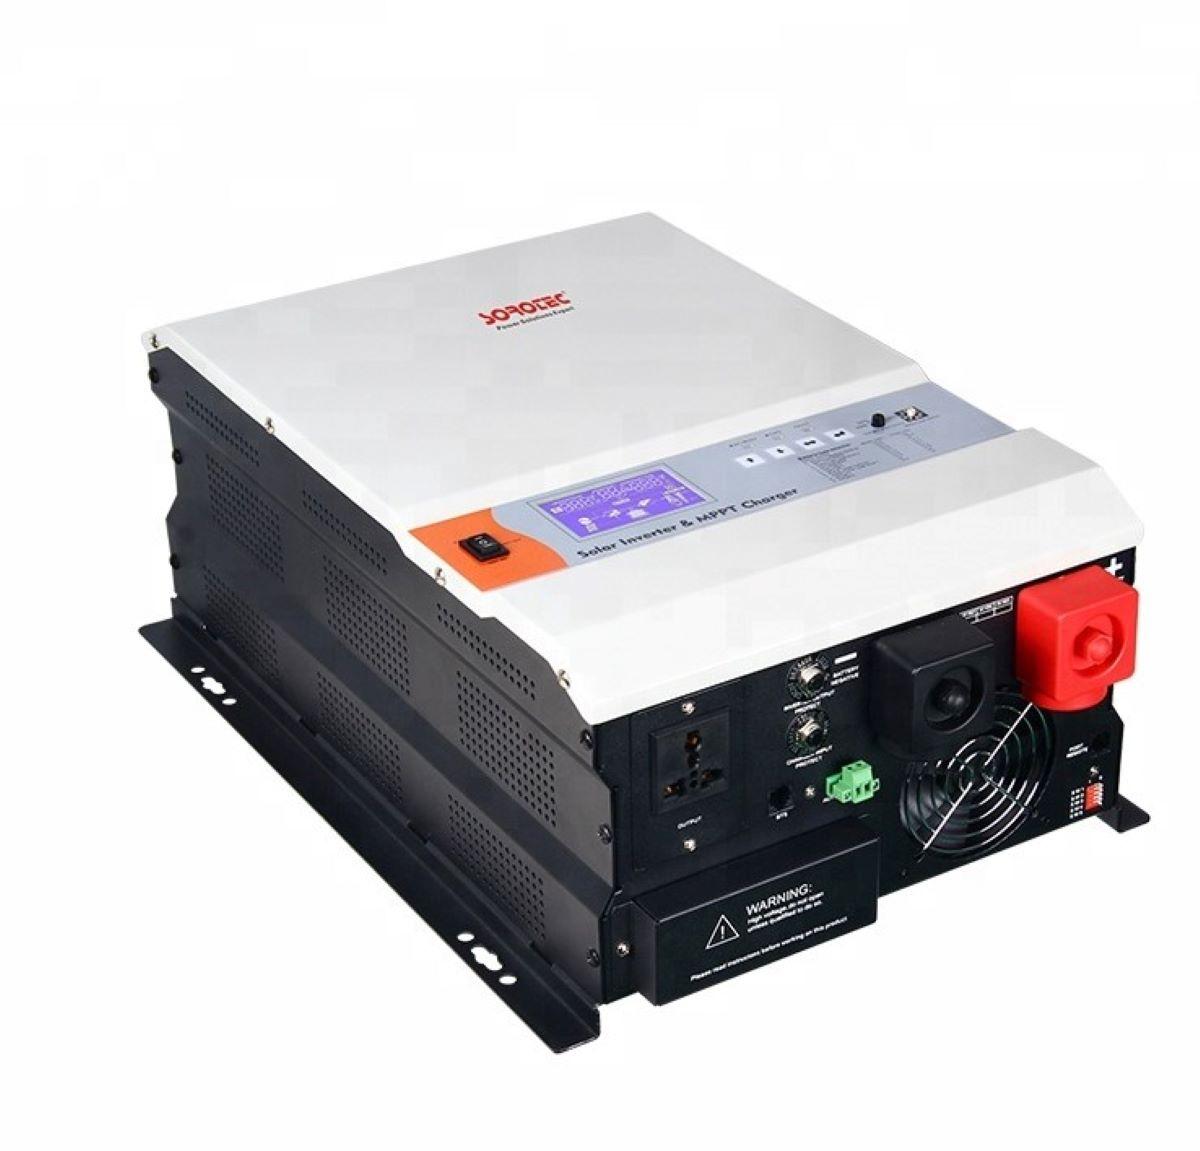 Inversor solar de onda sinusoidal pura baja frecuencia con controlador de carga solar SOROTEC MPPT SSP3115C 3KW